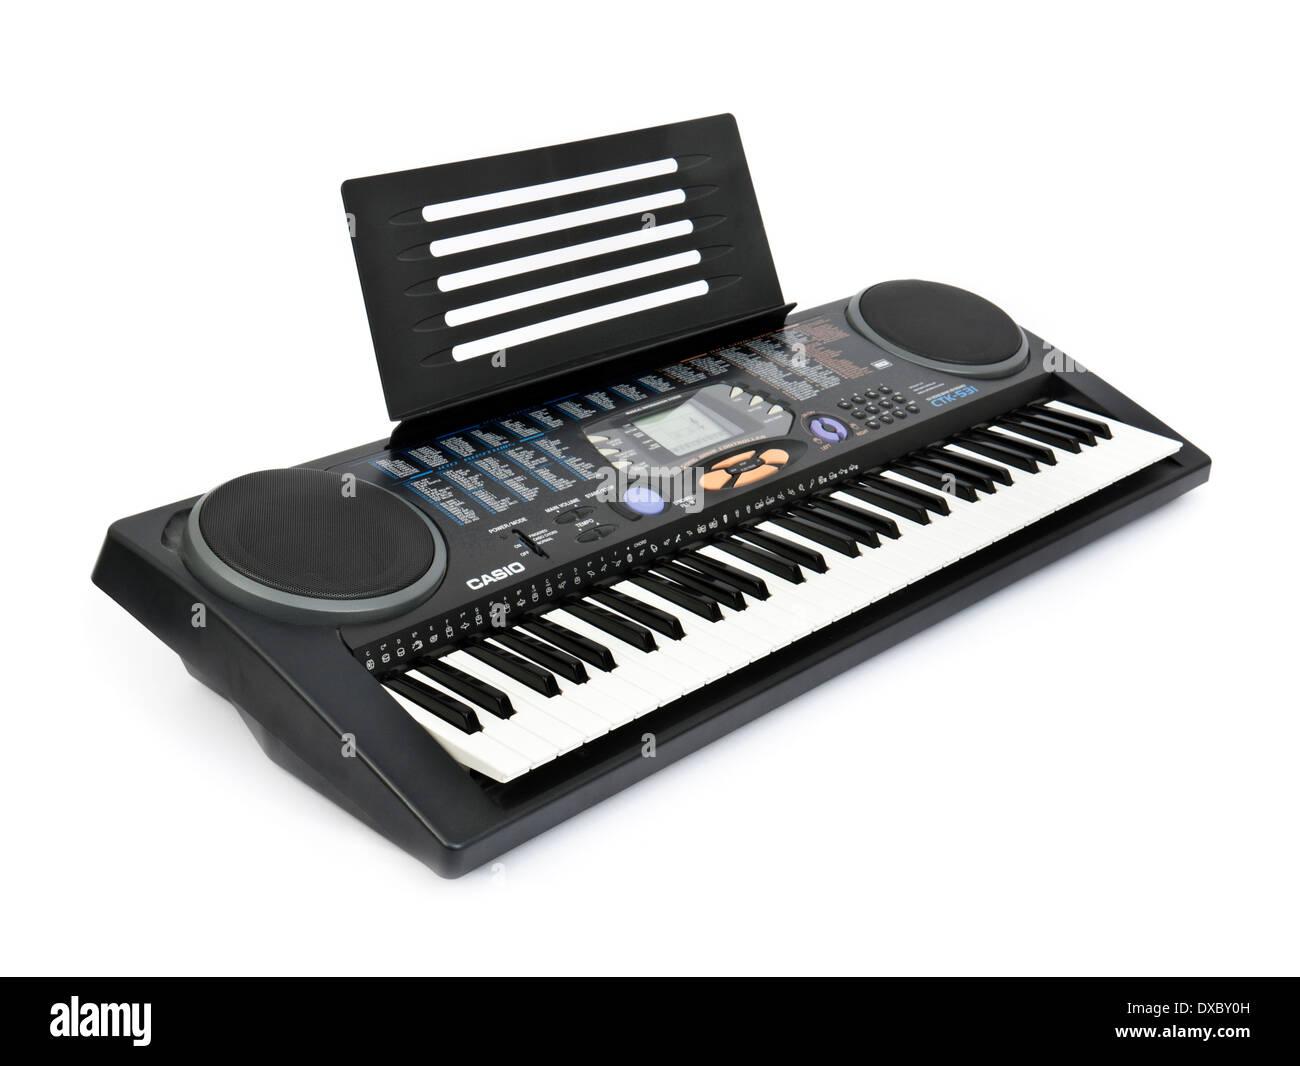 Casio CTK-531 portable MIDI electronic keyboard from 2008 - Stock Image